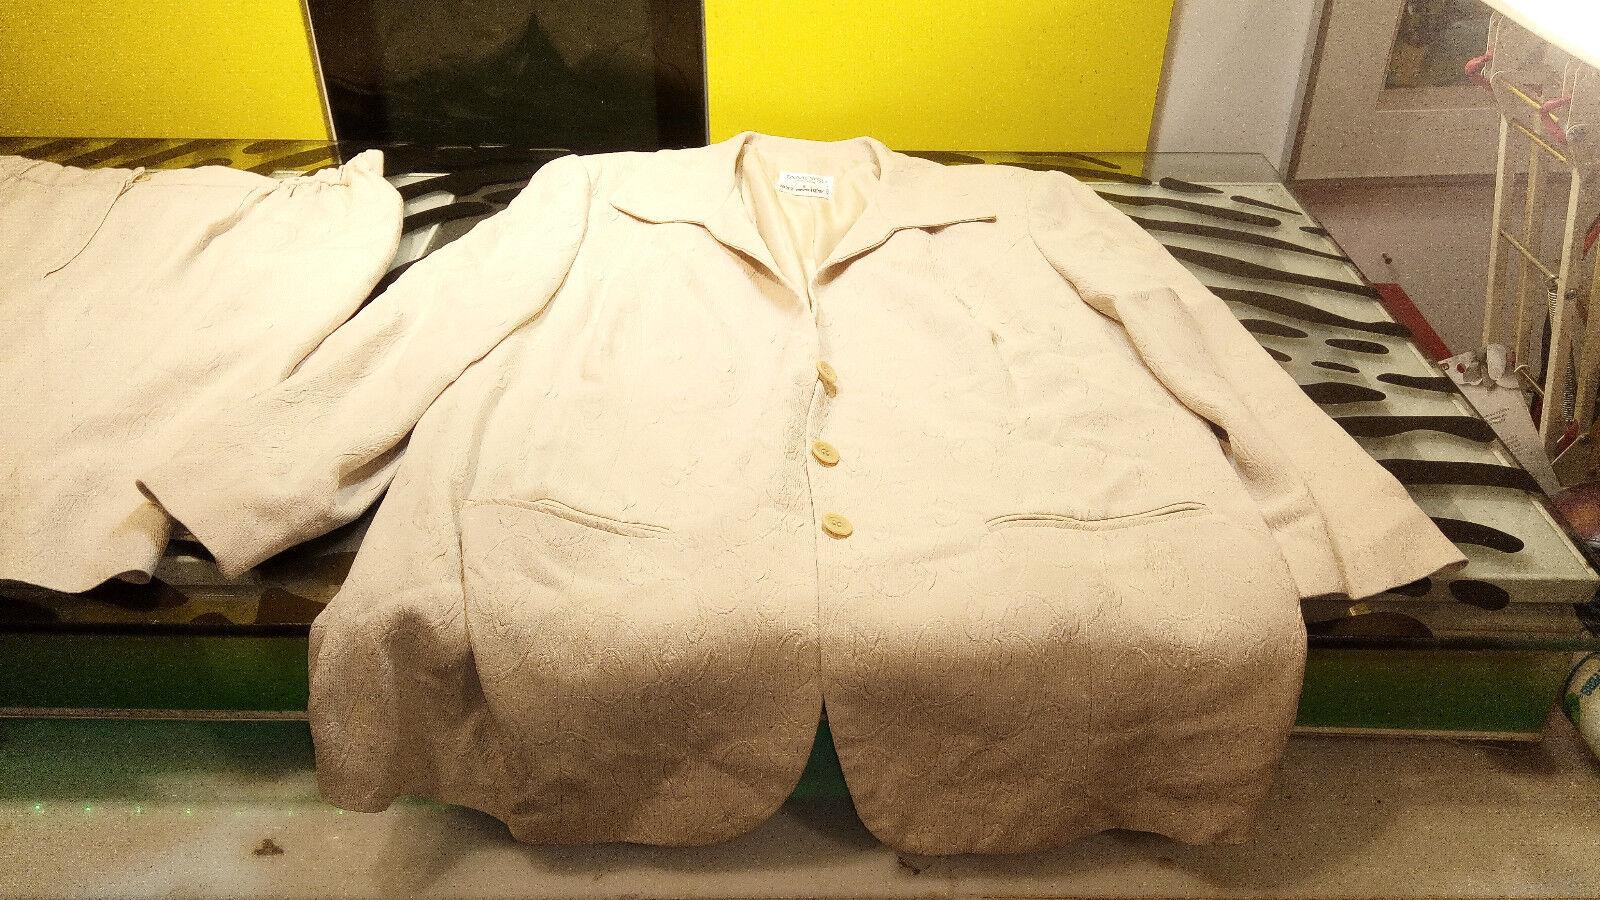 Tamotsu New York For Holt Renfrew Womens Skirt Set 3 pc Size 2 Good vintage